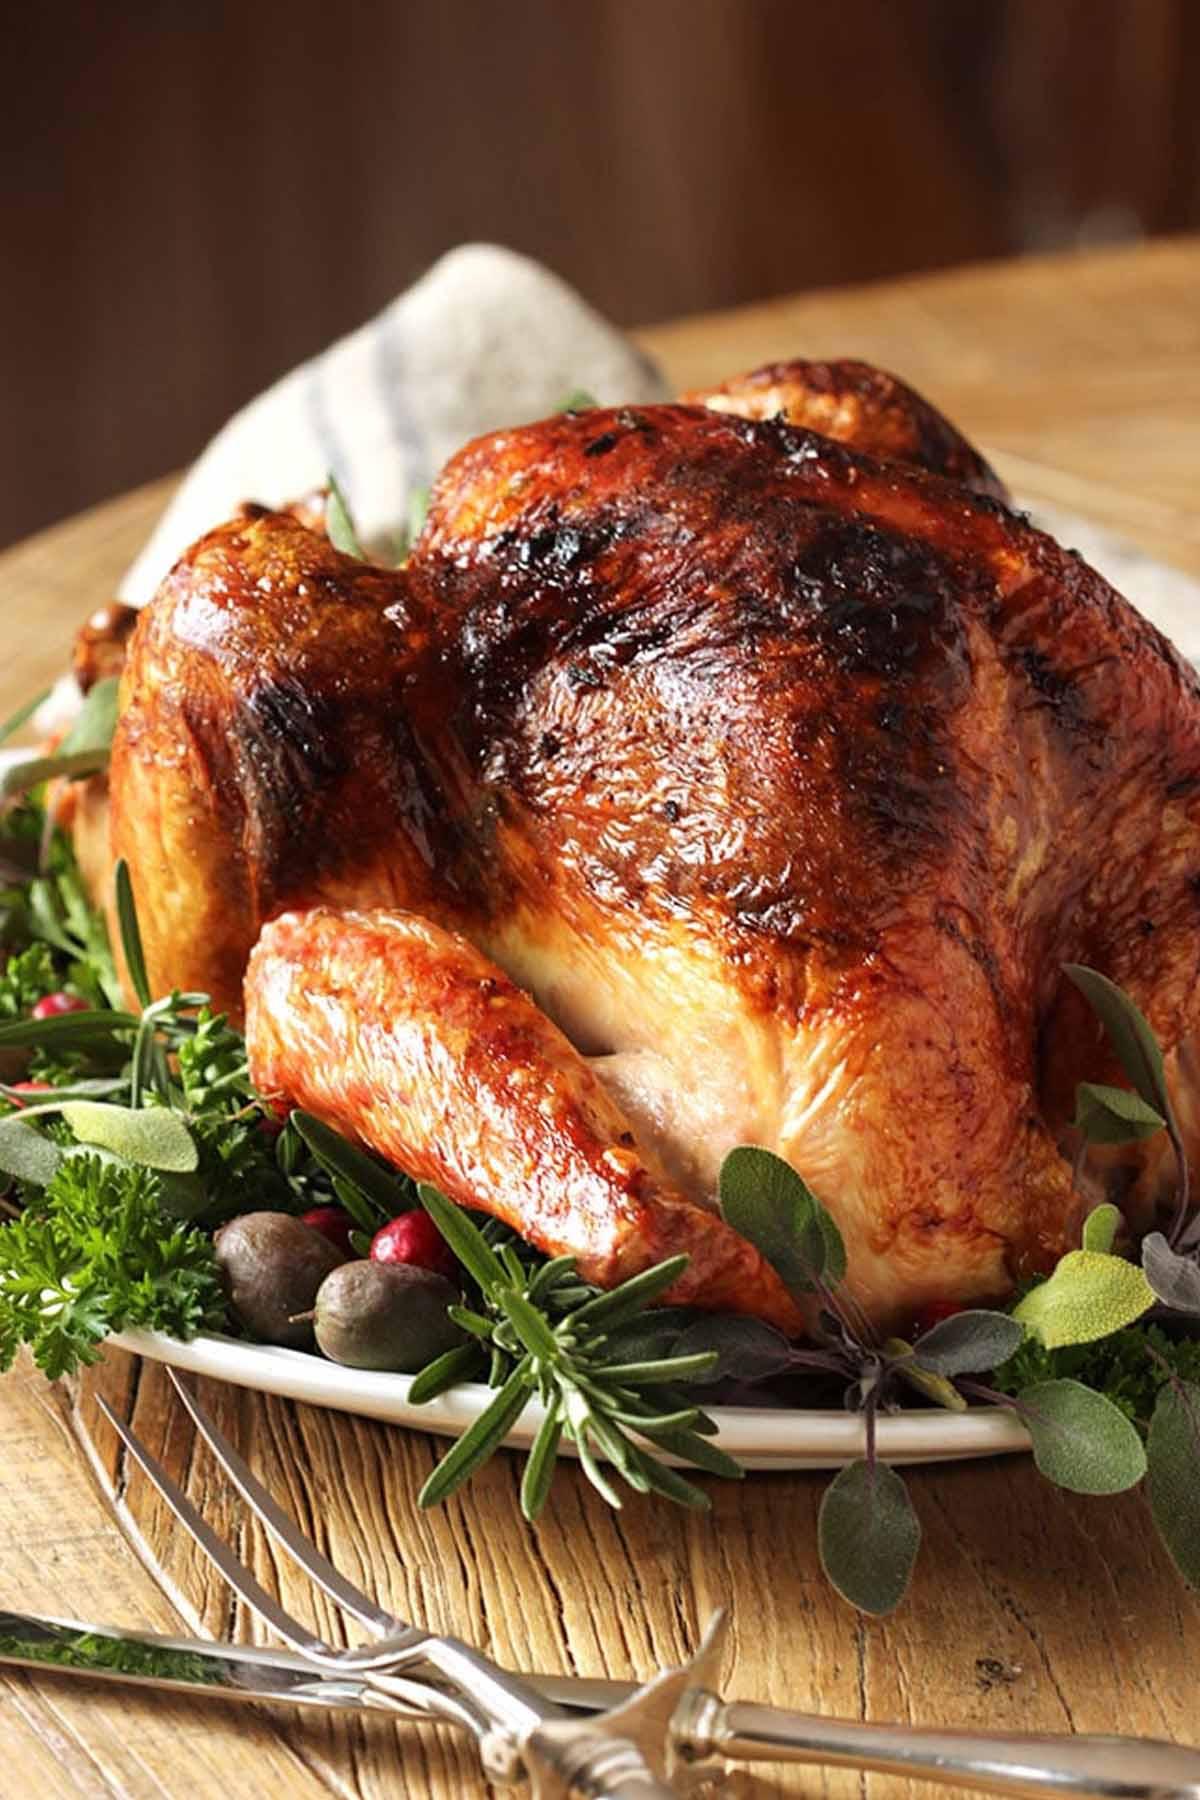 Recipes For Thanksgiving Turkey  19 Best Thanksgiving Turkey Recipes Easy Roast Turkey